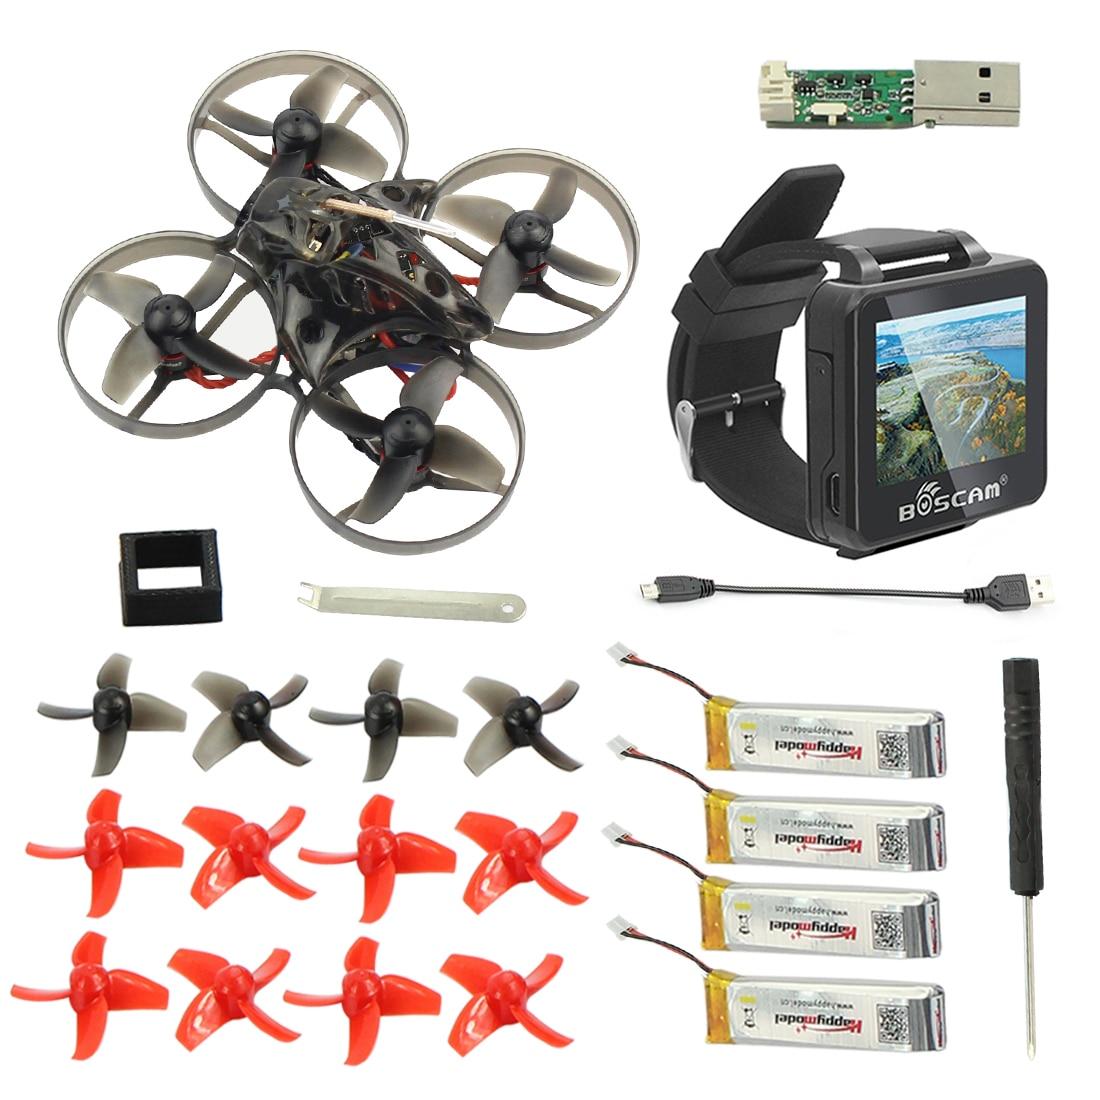 Mobula7 Mobula 7 75mm Crazybee F3 Pro OSD 2 S RC FPV Racing Drone Compatible Frsky Flysky avec BOSCAM BOS200RC FPV Montre